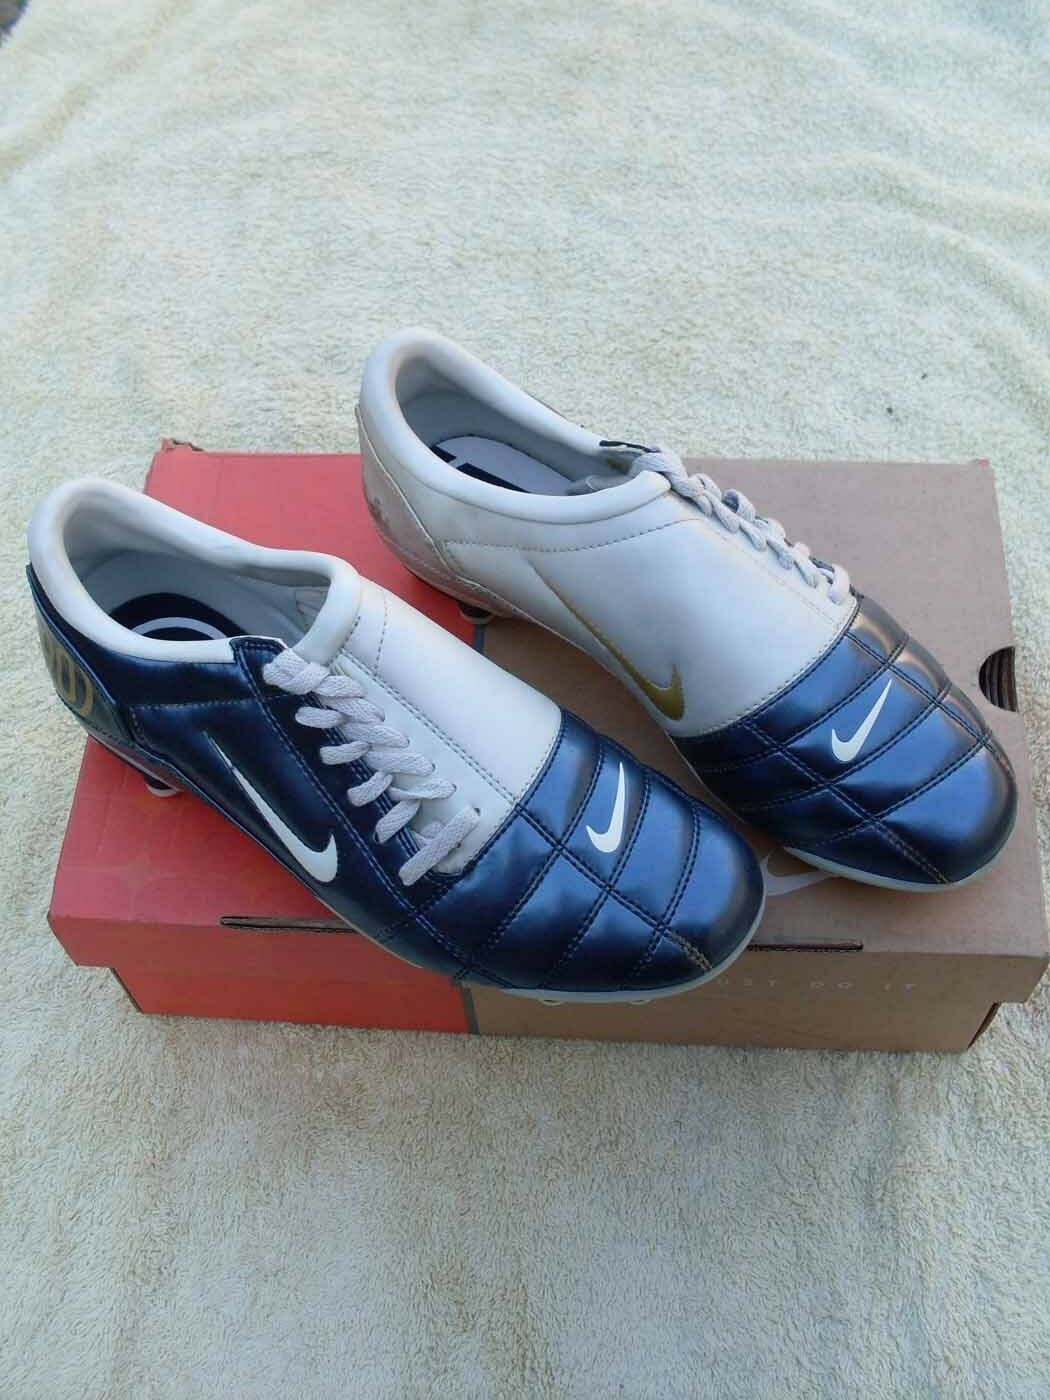 New zapatos Nike JR total 90 III FG Talla 38,5 5,5 24 cm socer zapatos